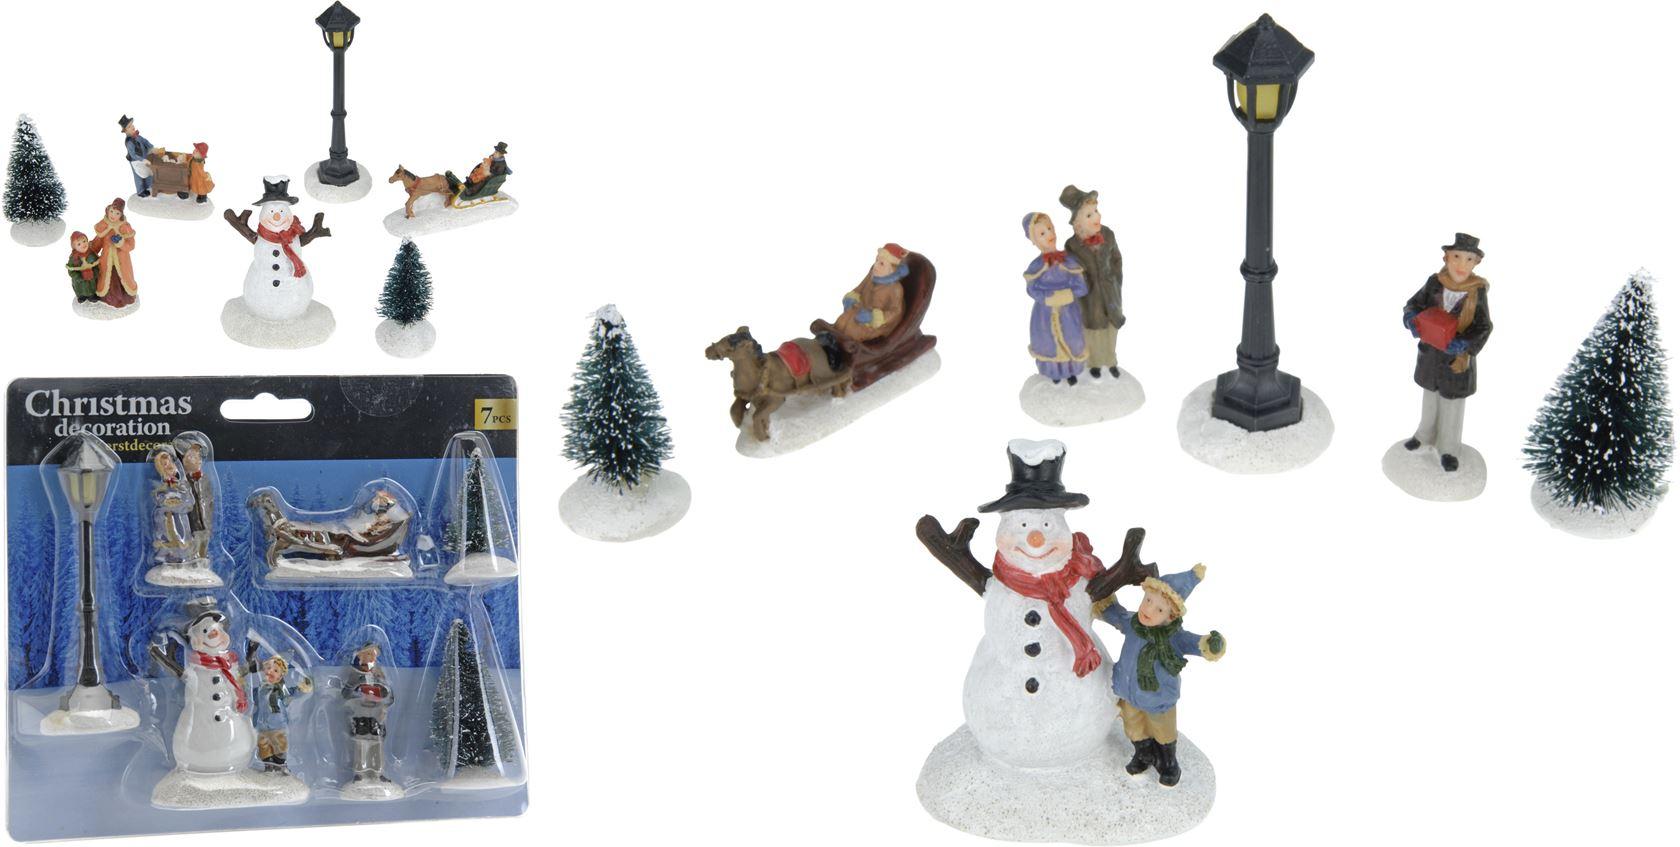 kerstdecoratie set (7sts)(2ass.)